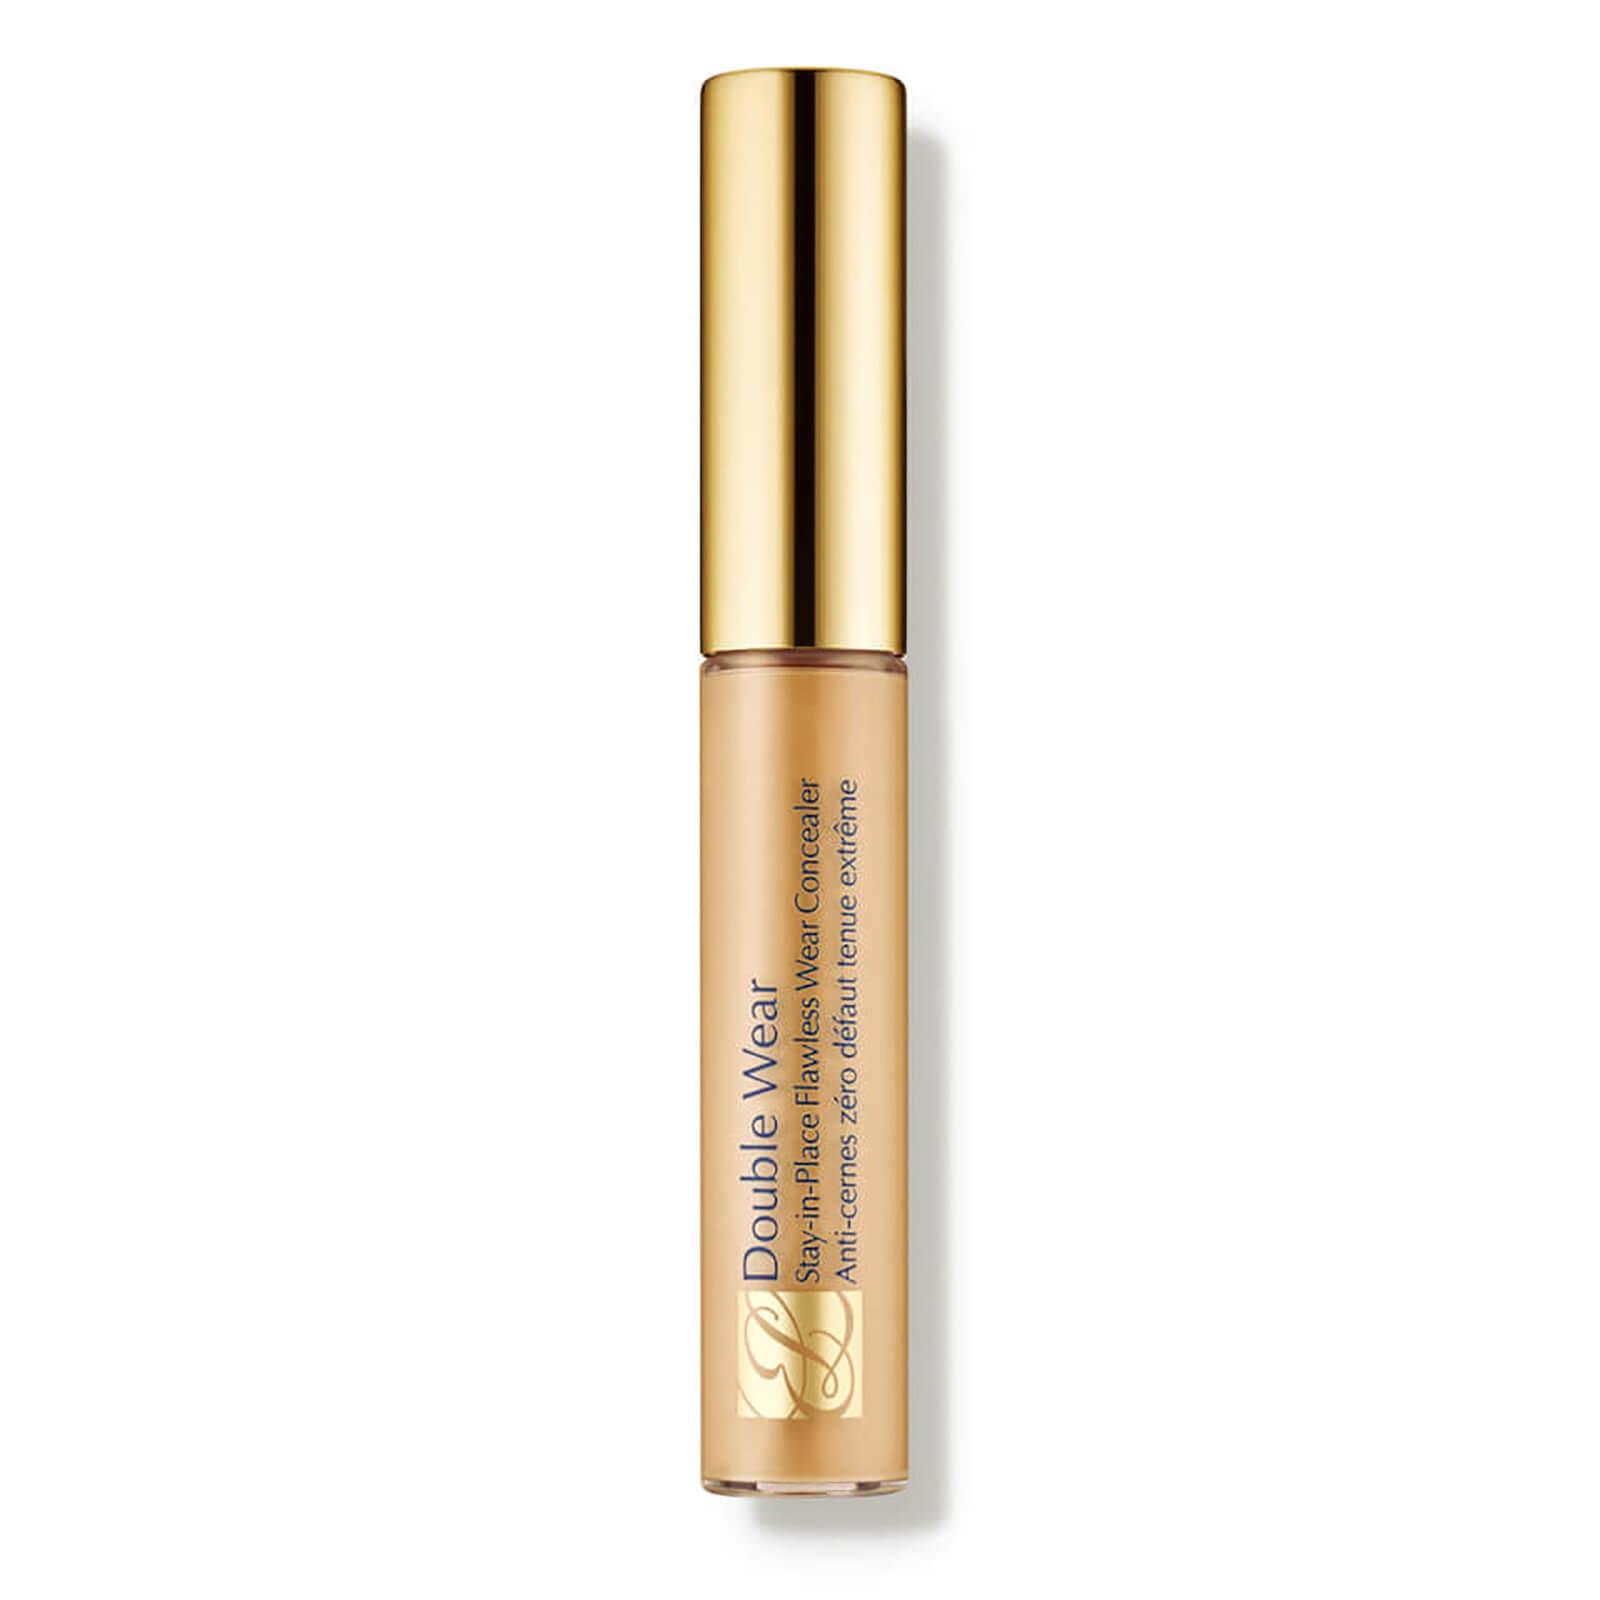 Купить Estée Lauder Double Wear Stay-in-Place Flawless Wear Concealer 7ml (Various Shades) - 1W Light